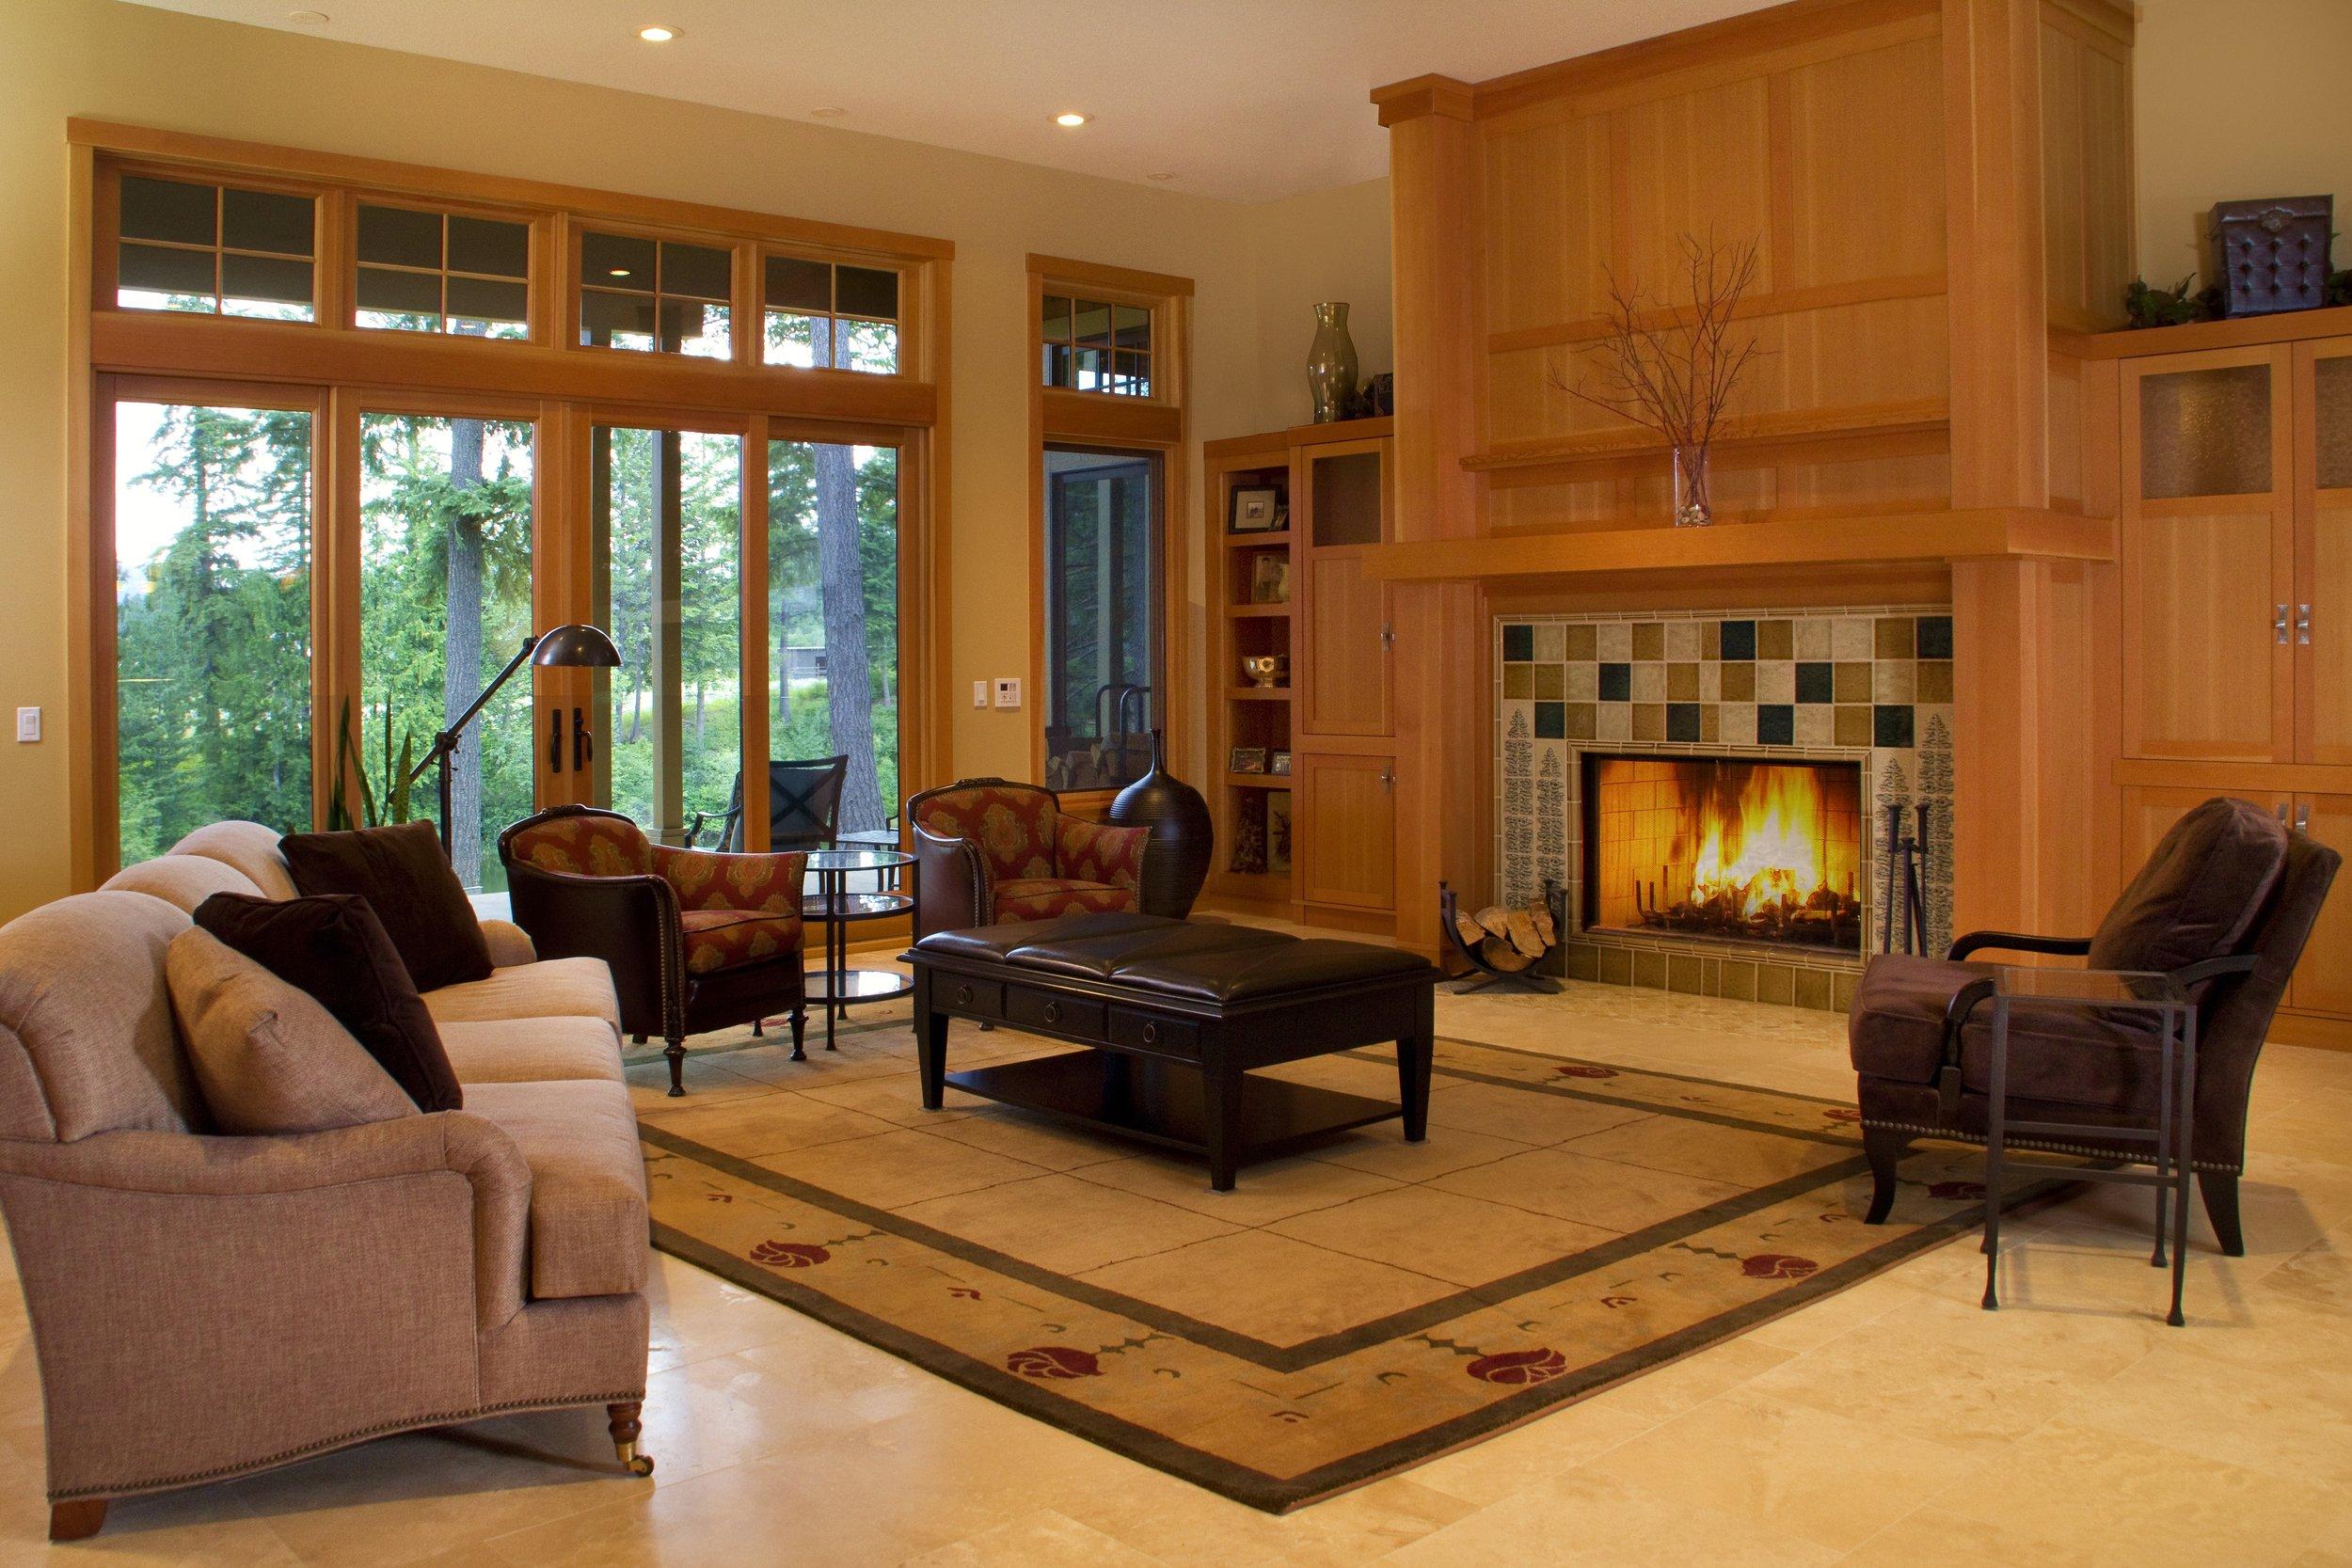 5 Living Room & Fireplace - Copy.jpg